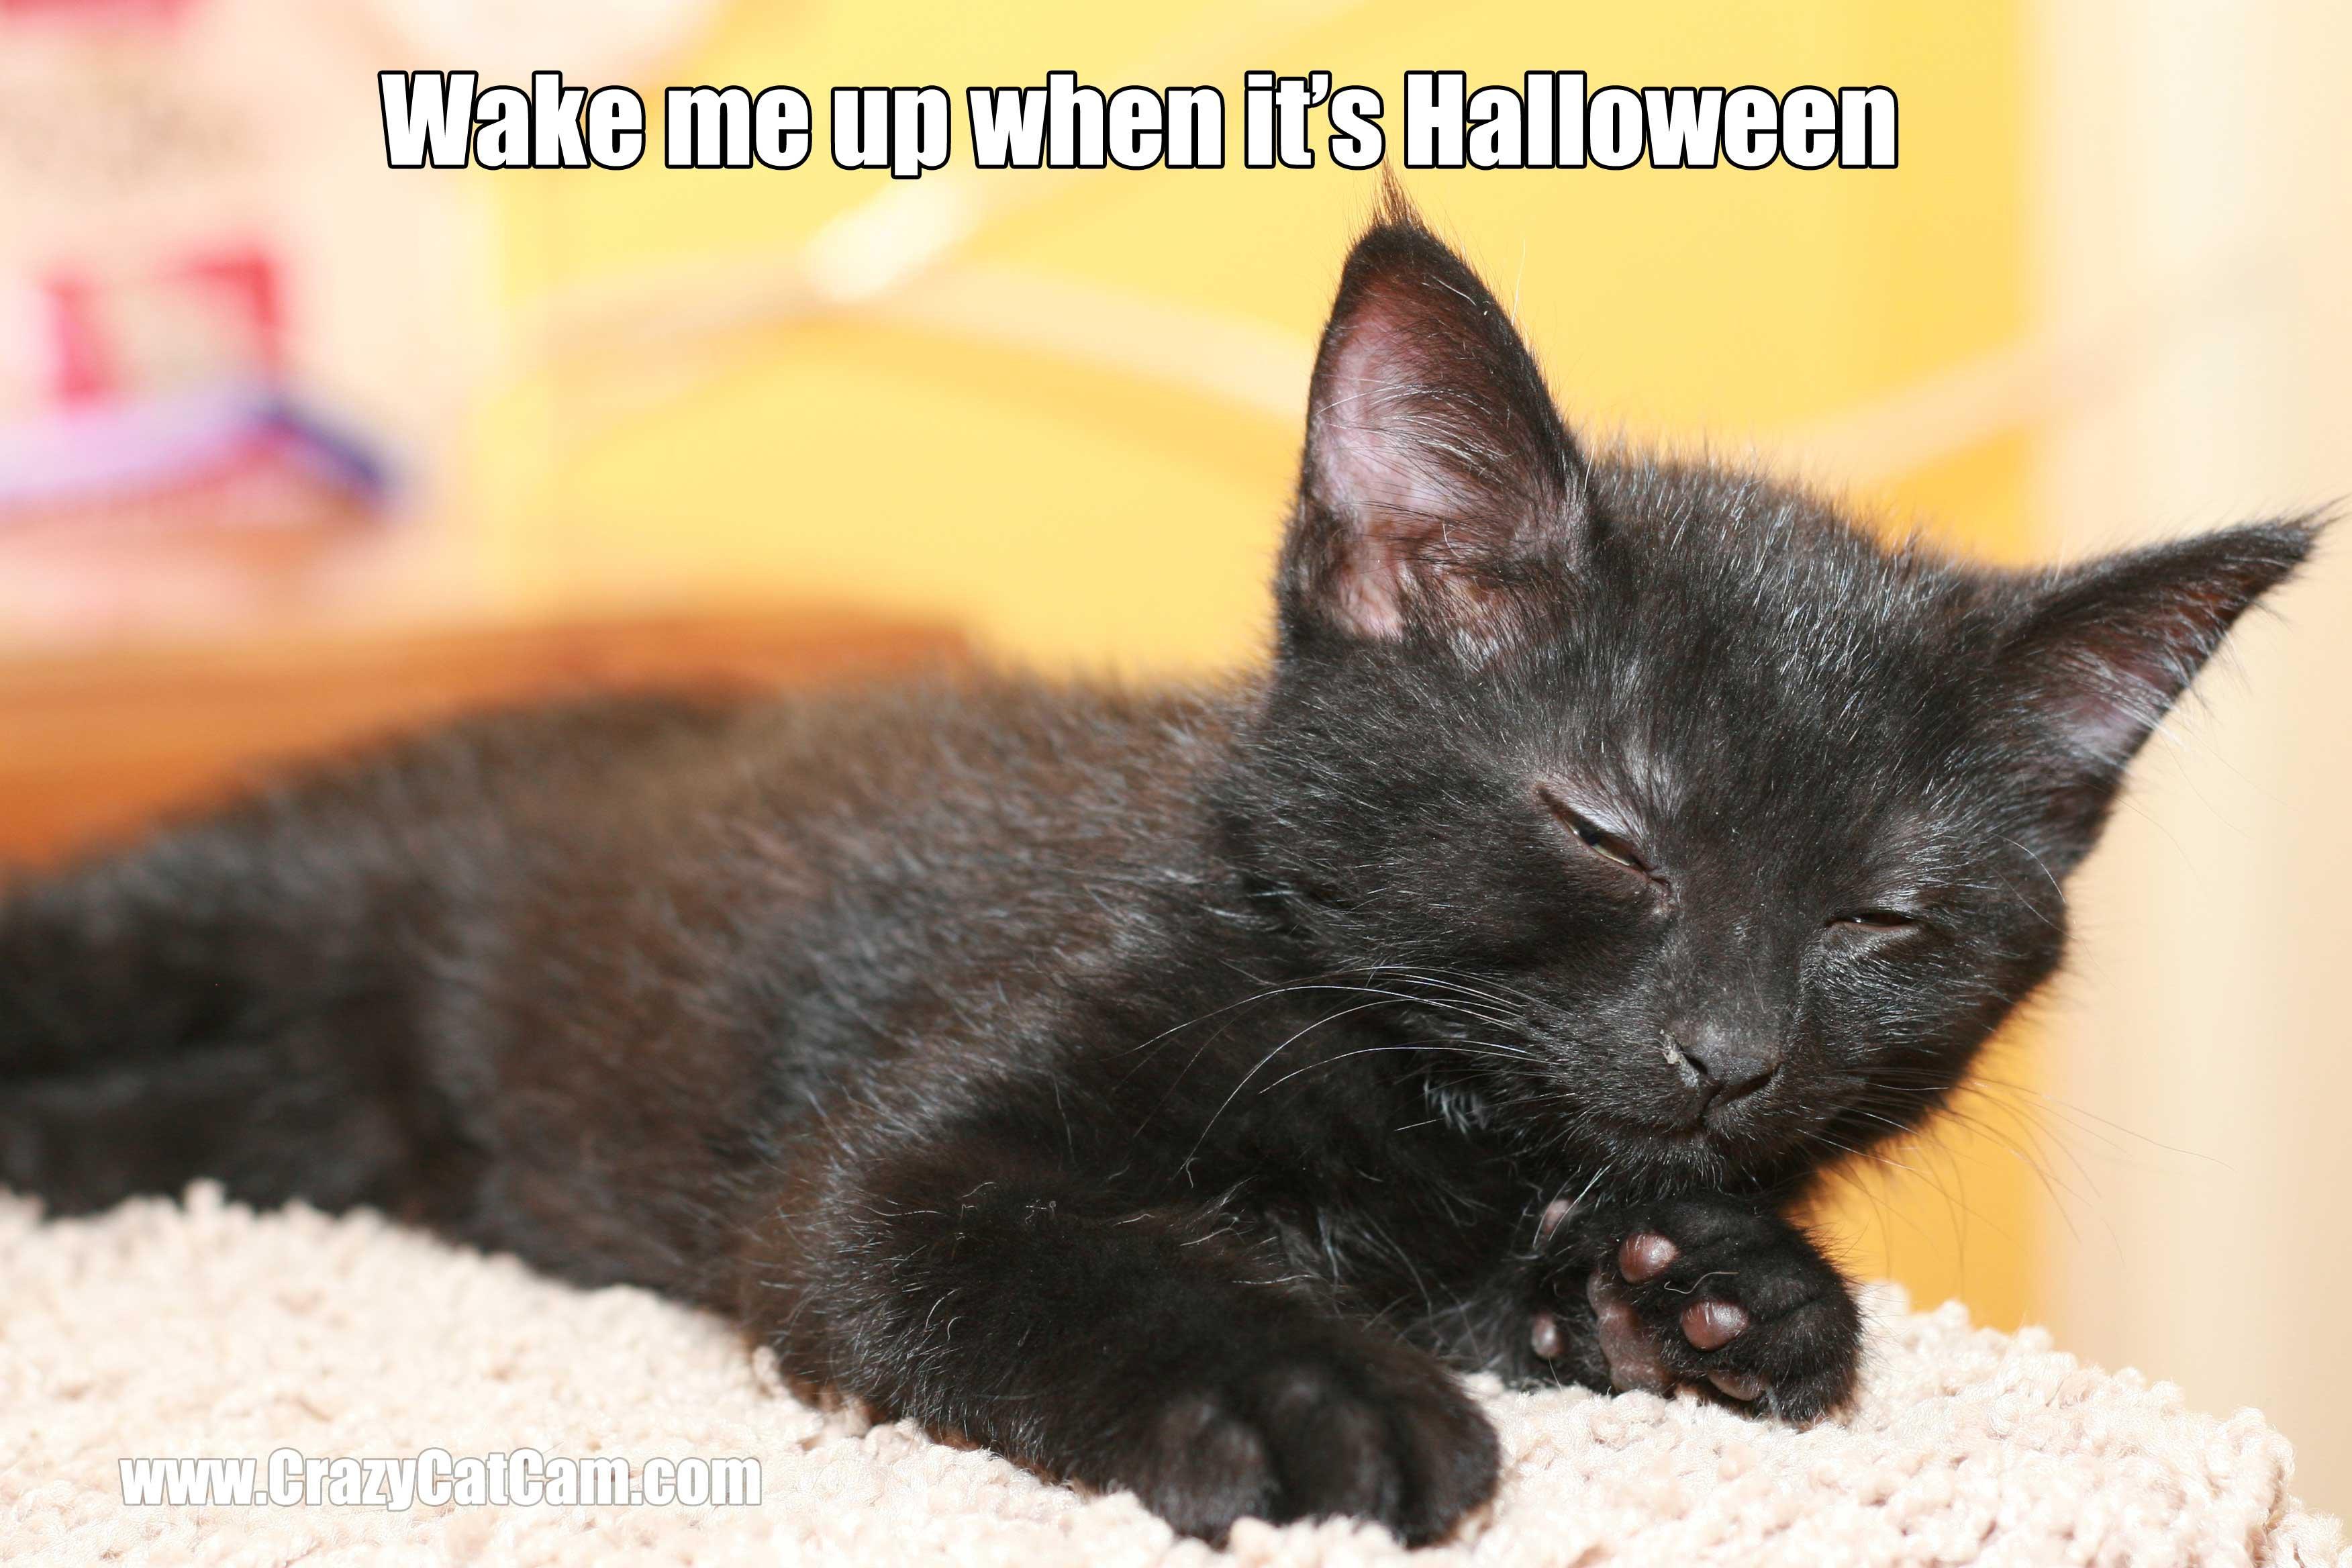 Charming Cat Meme Quote Funny Humor Grumpy Kitten Wallpaper | 3504x2336 | 355157 |  WallpaperUP